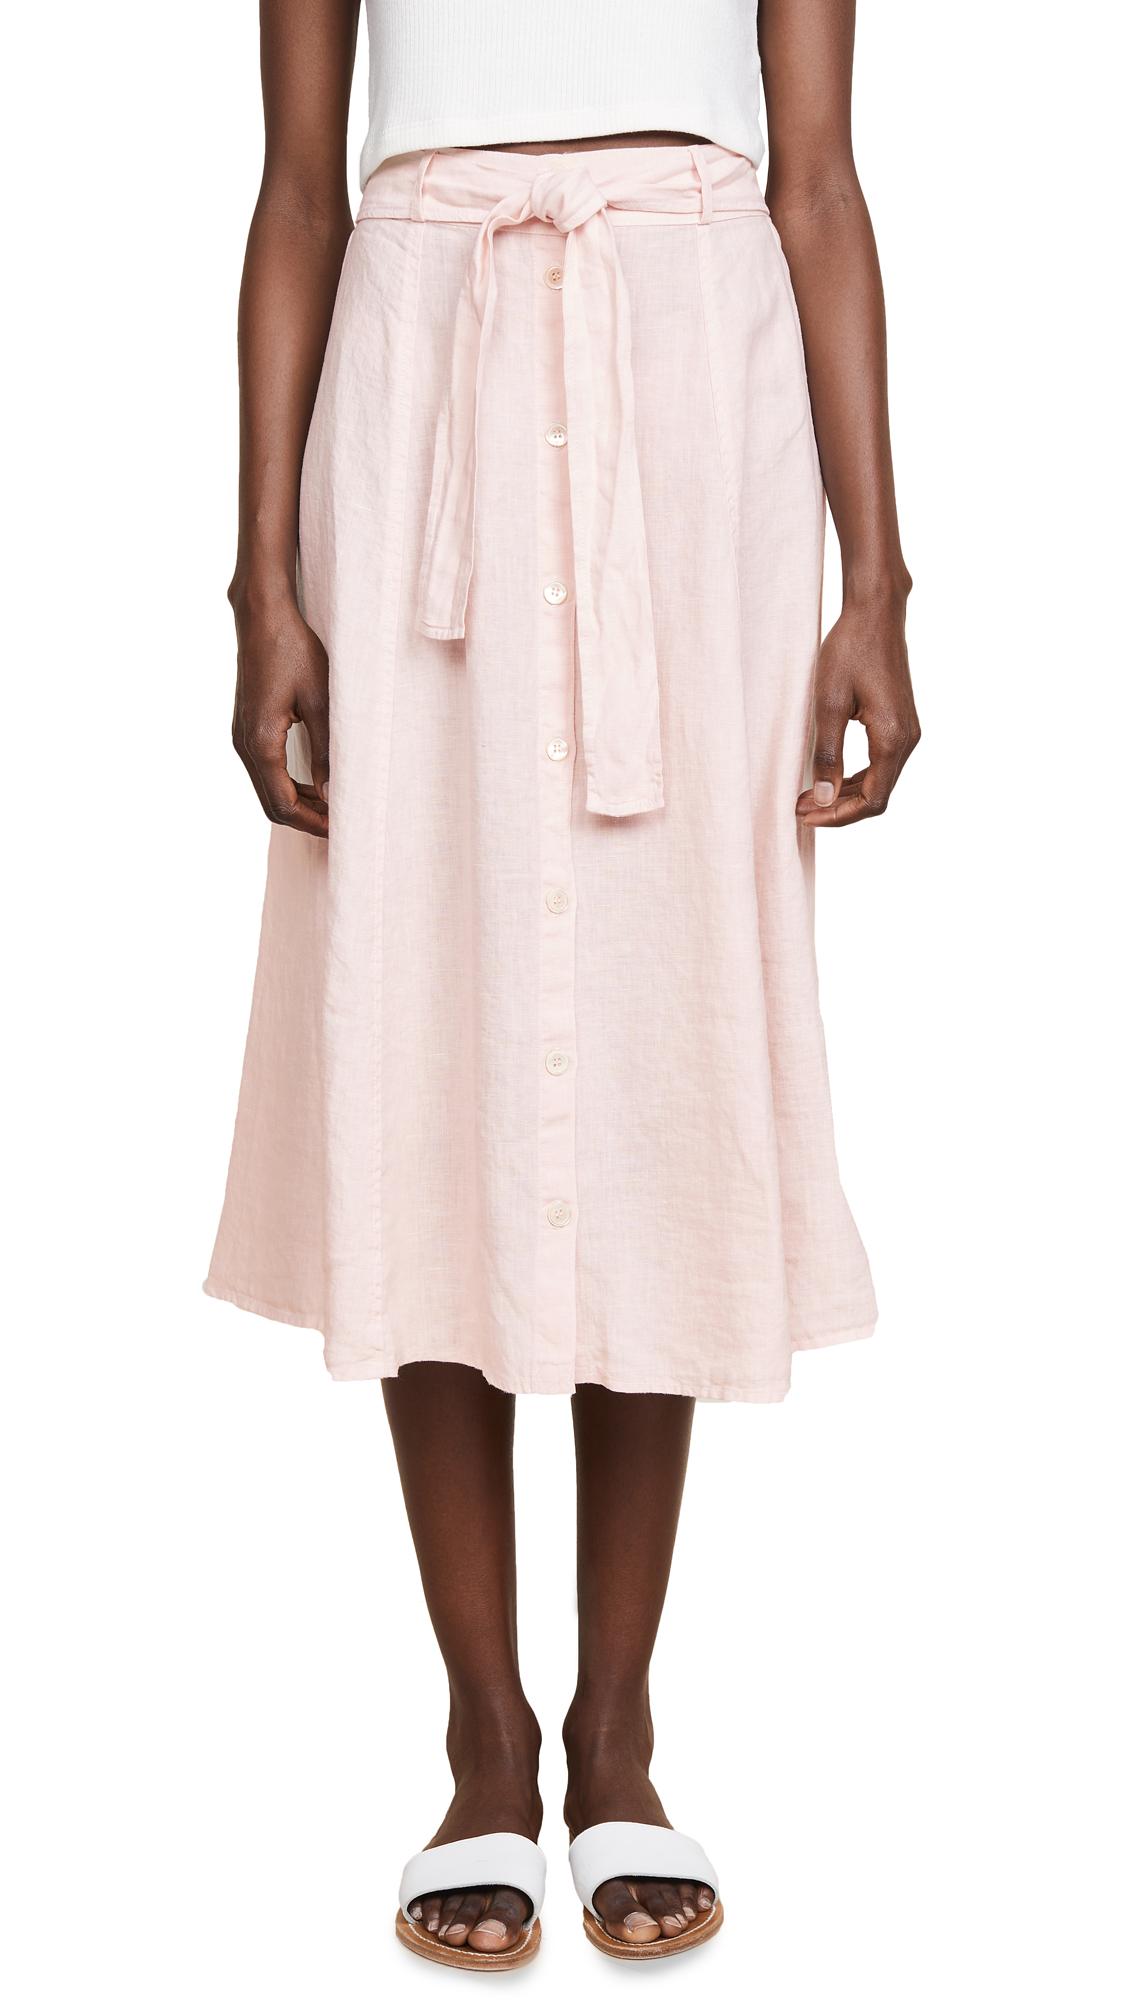 Three Dots Seamed Midi Skirt In Pink Lemonade